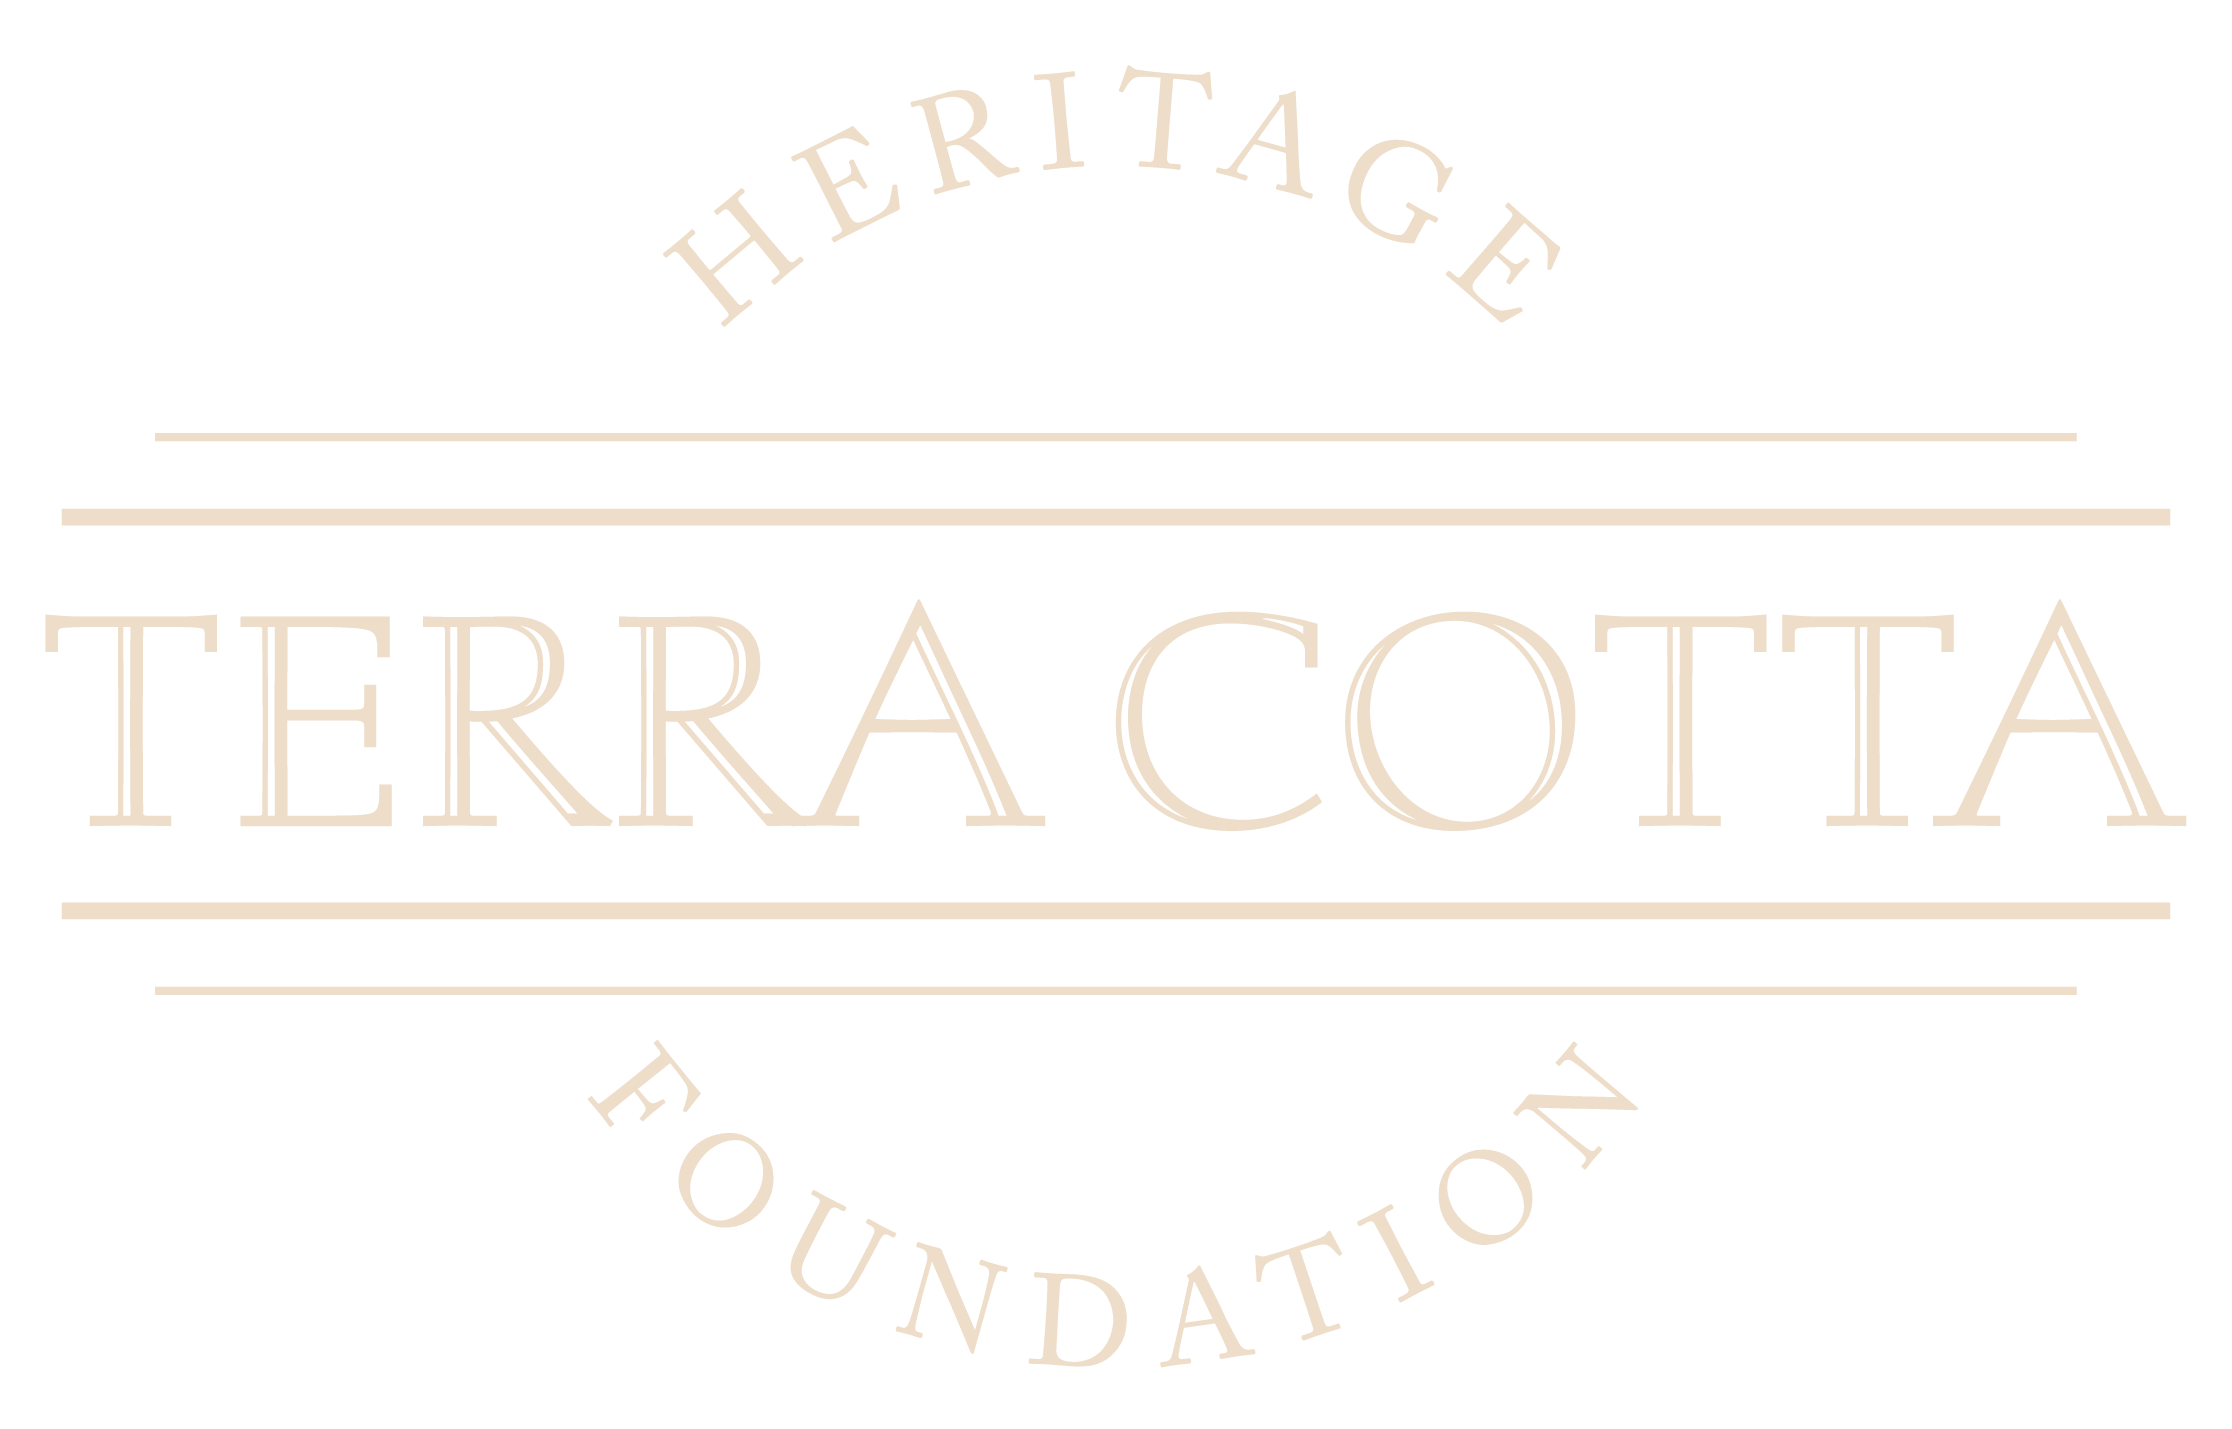 Terra Cotta Heritage Foundation logo